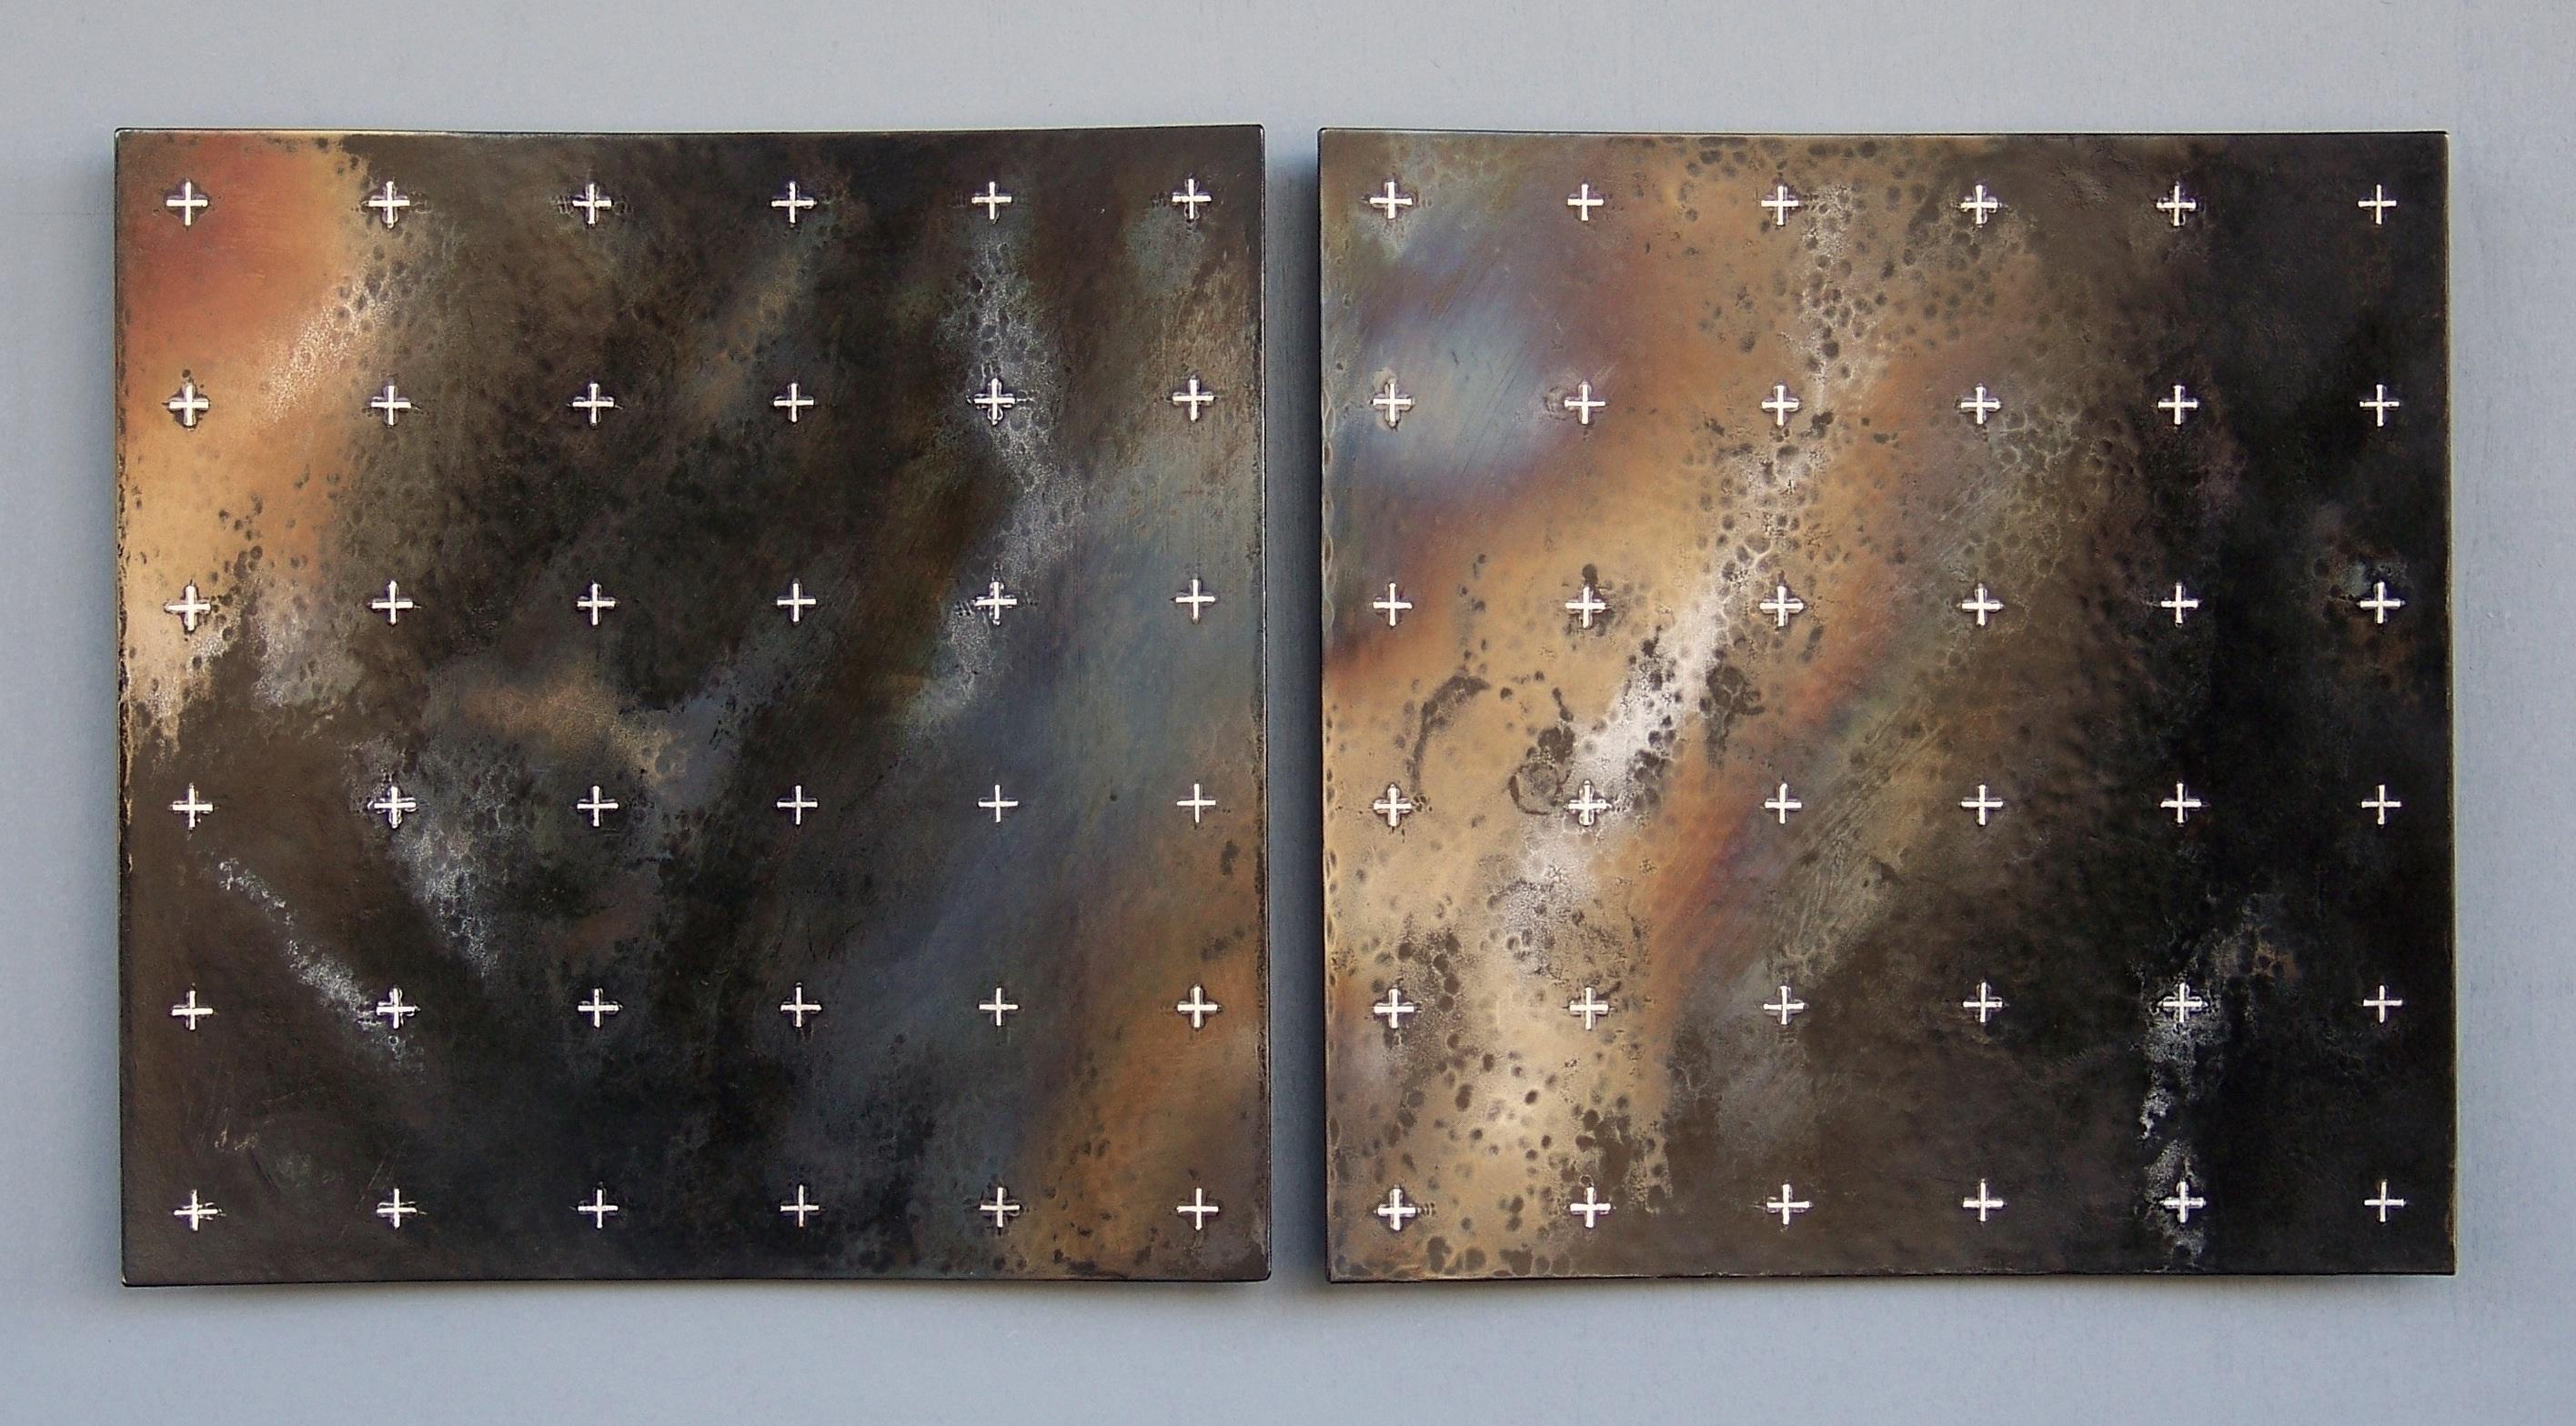 1.Latenza, 2014, 49,5 x 24 x 2 cm, oljebrent og anløpt stål med innlagt sølvtråd